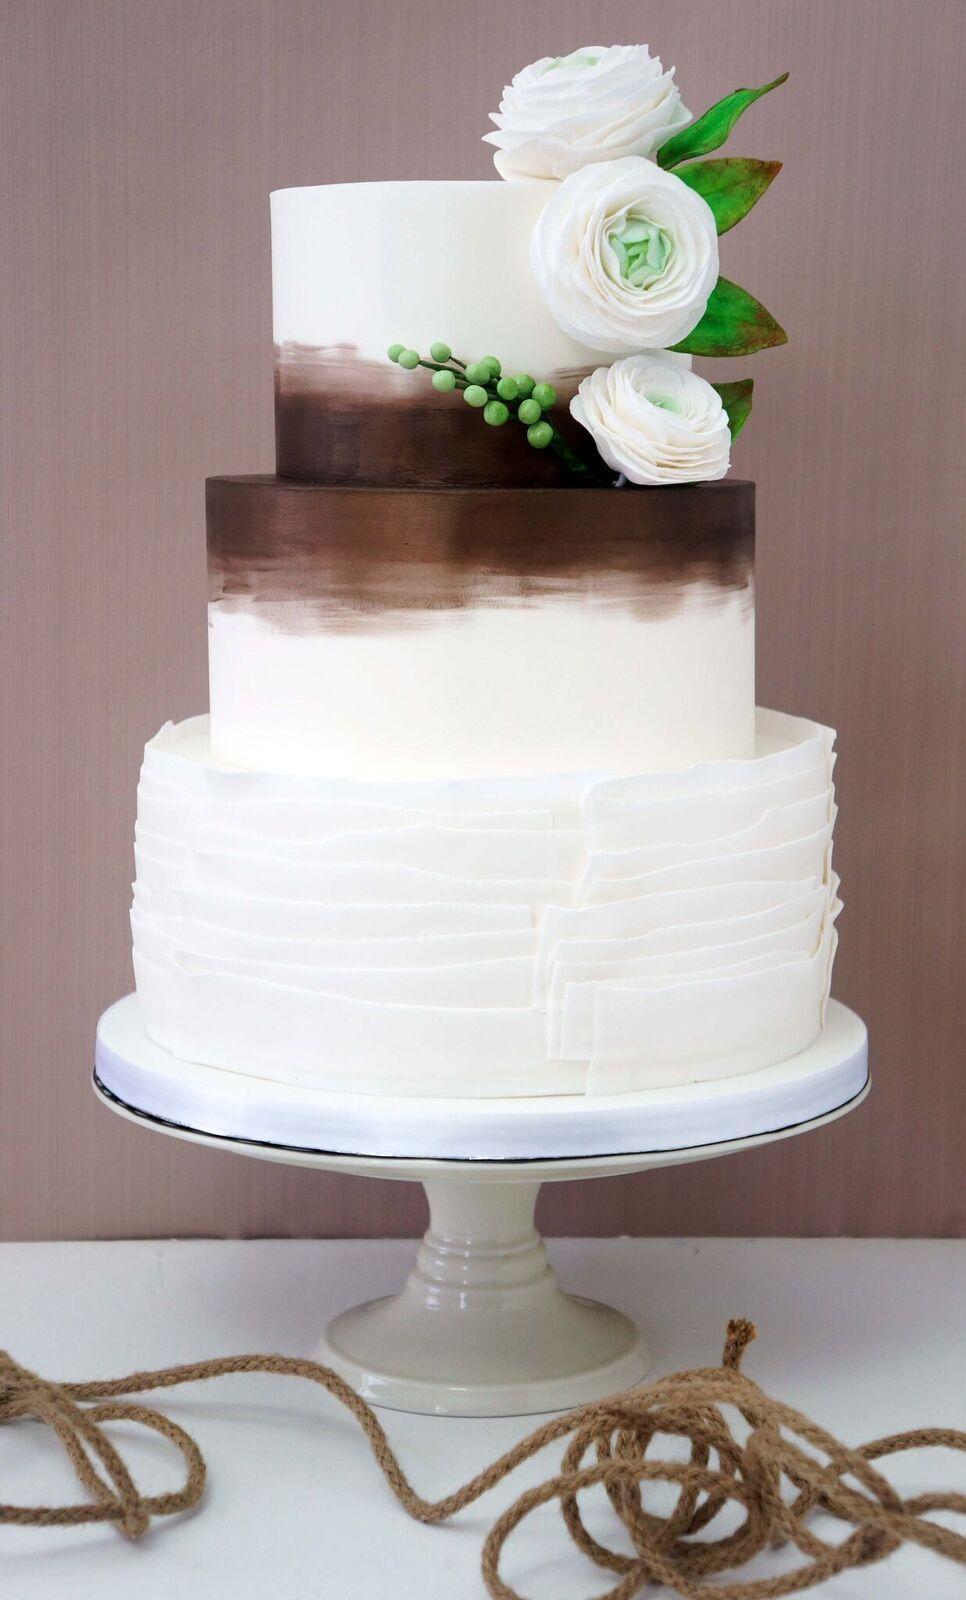 Brown and white ruffle wedding